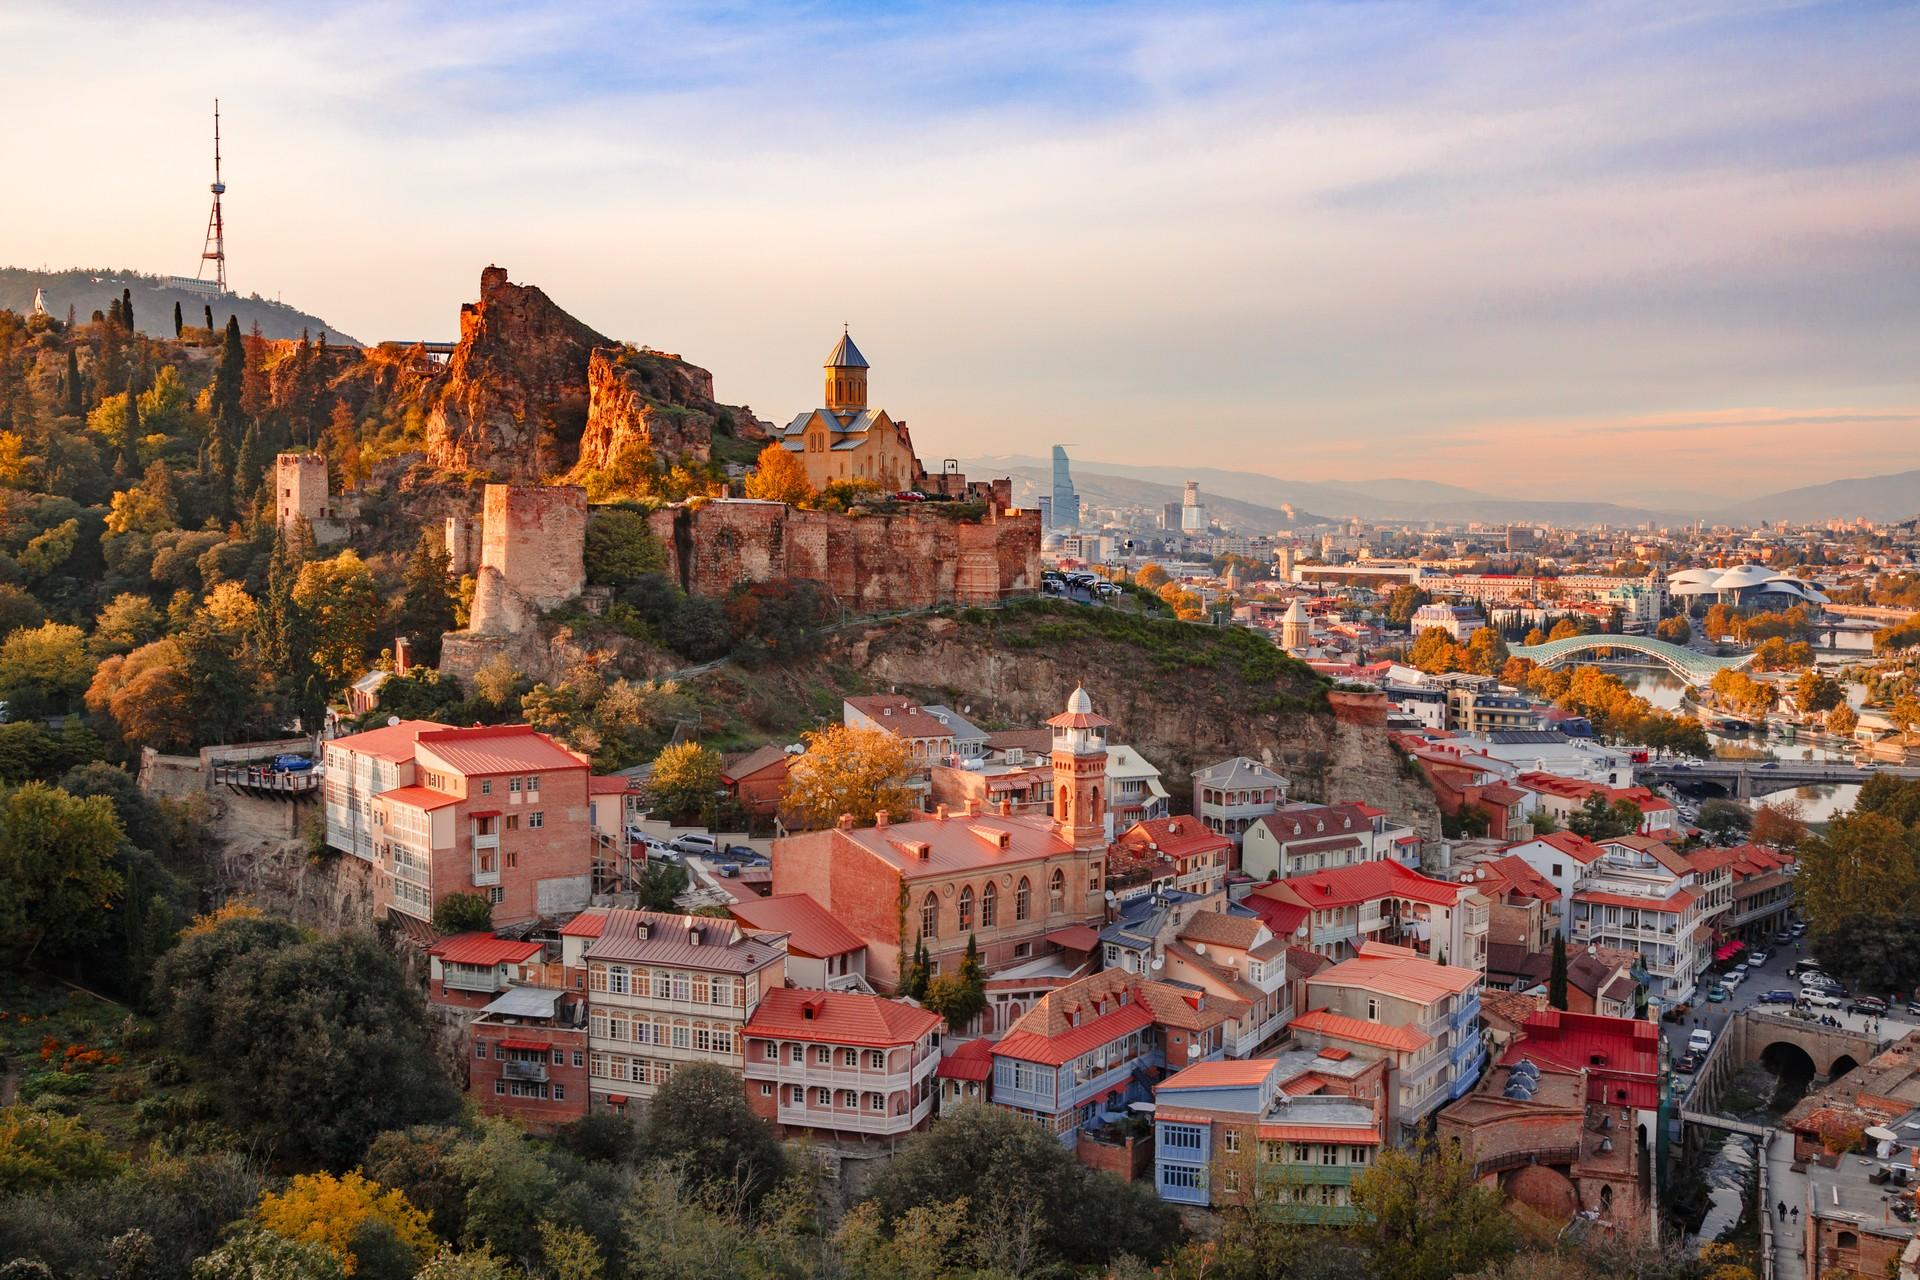 Tbilisi is Georgia's bustling capital city